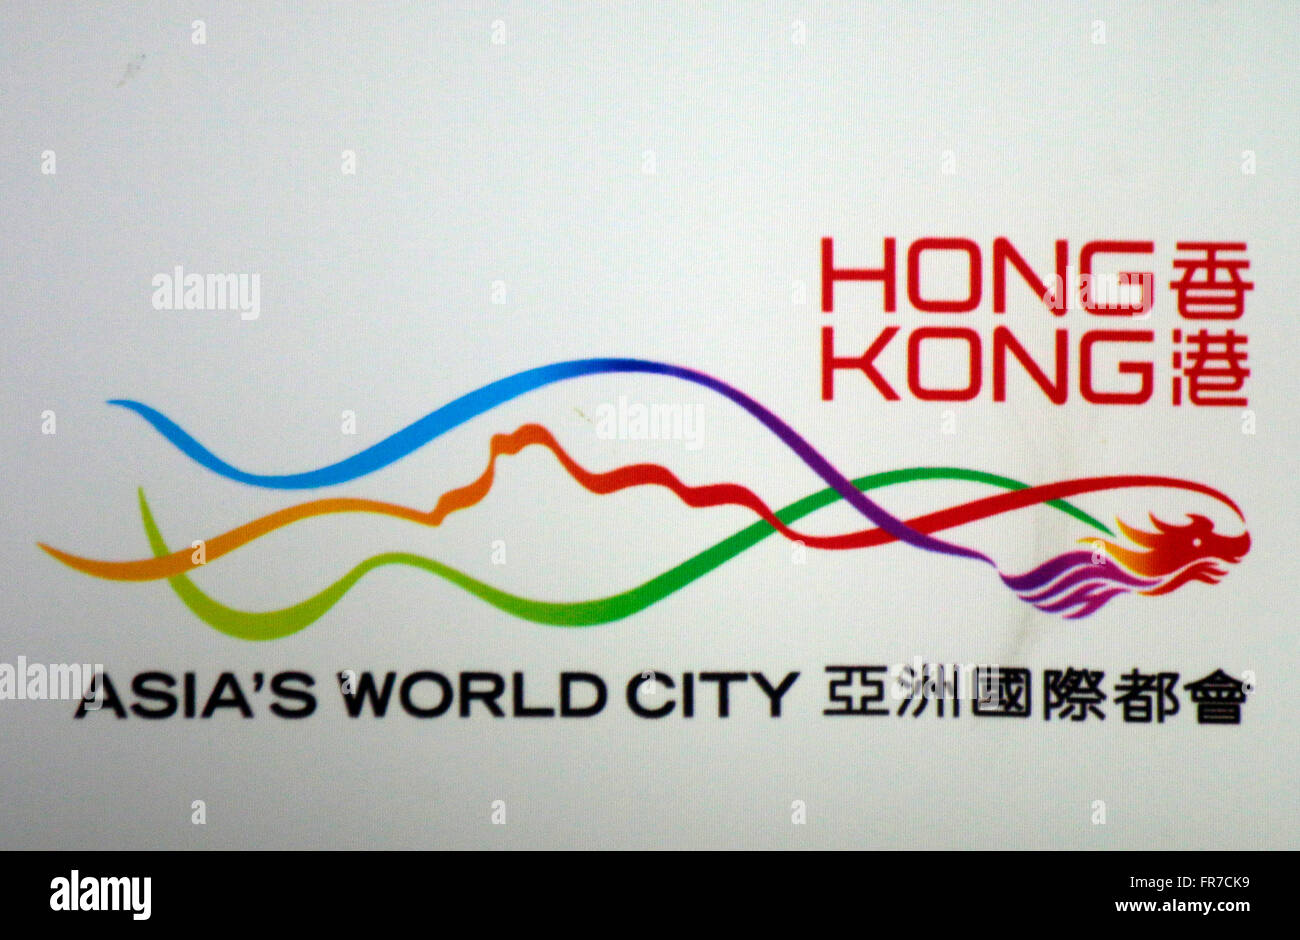 das offizielle Logo von HongKong, Berlin. - Stock Image